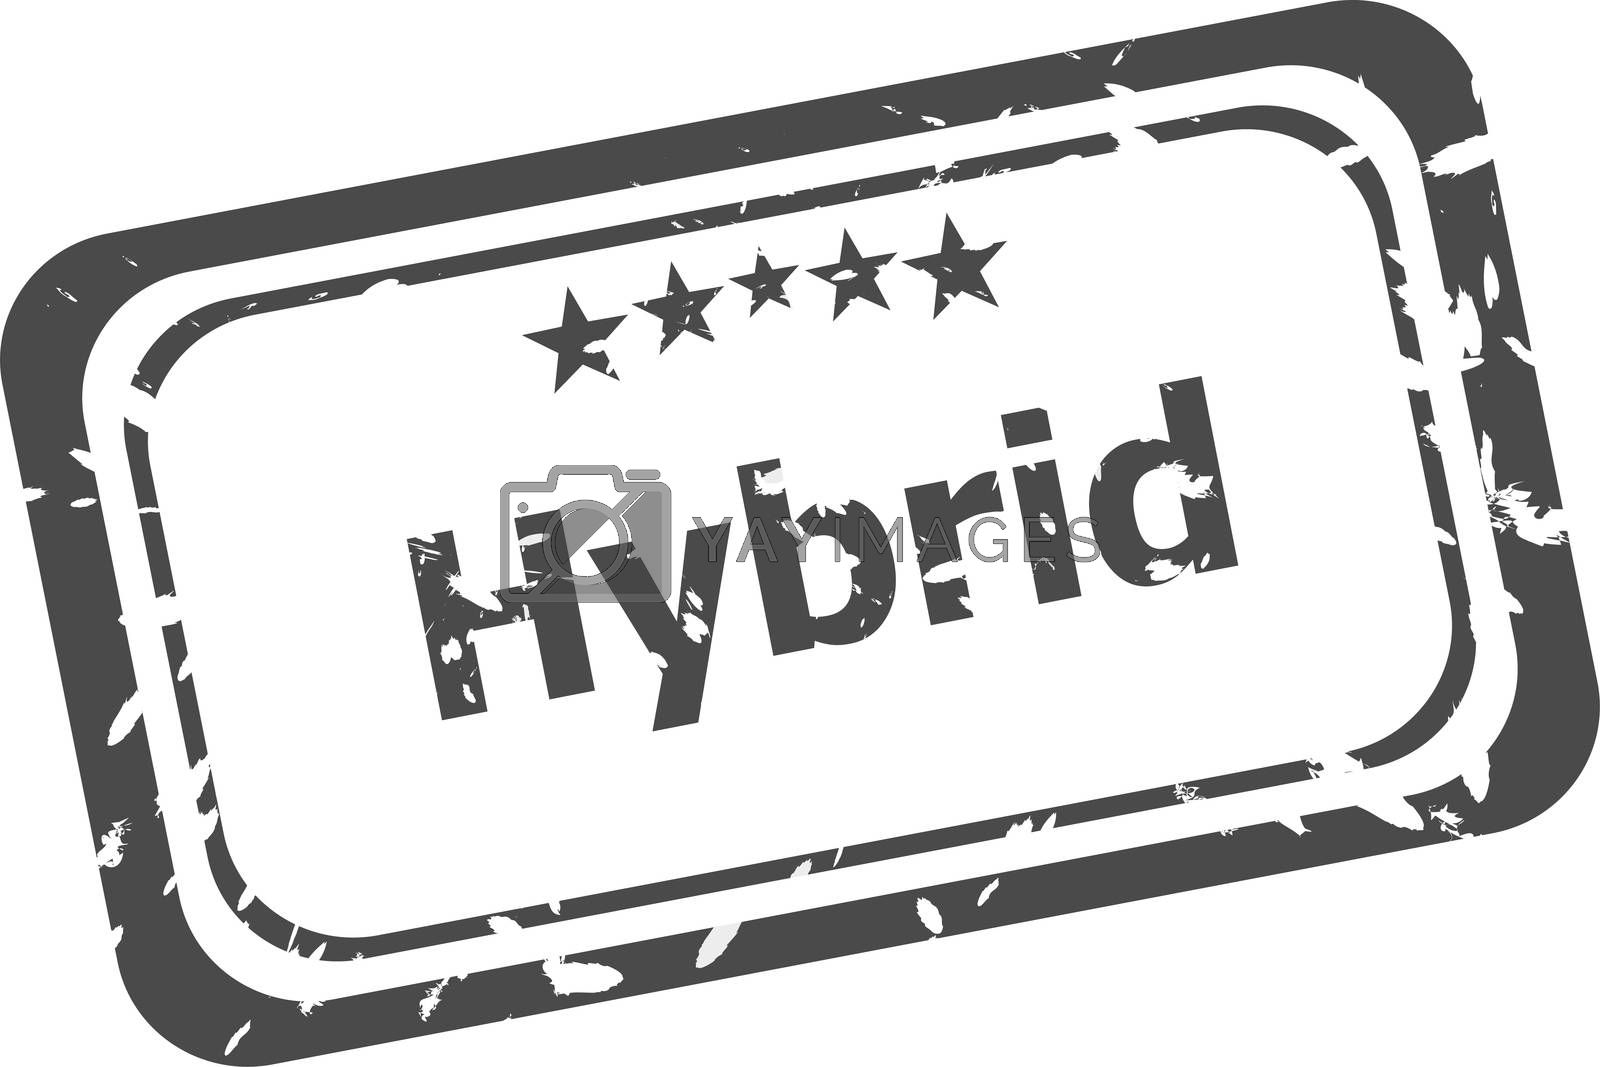 hybrid grunge rubber stamp isolated on white